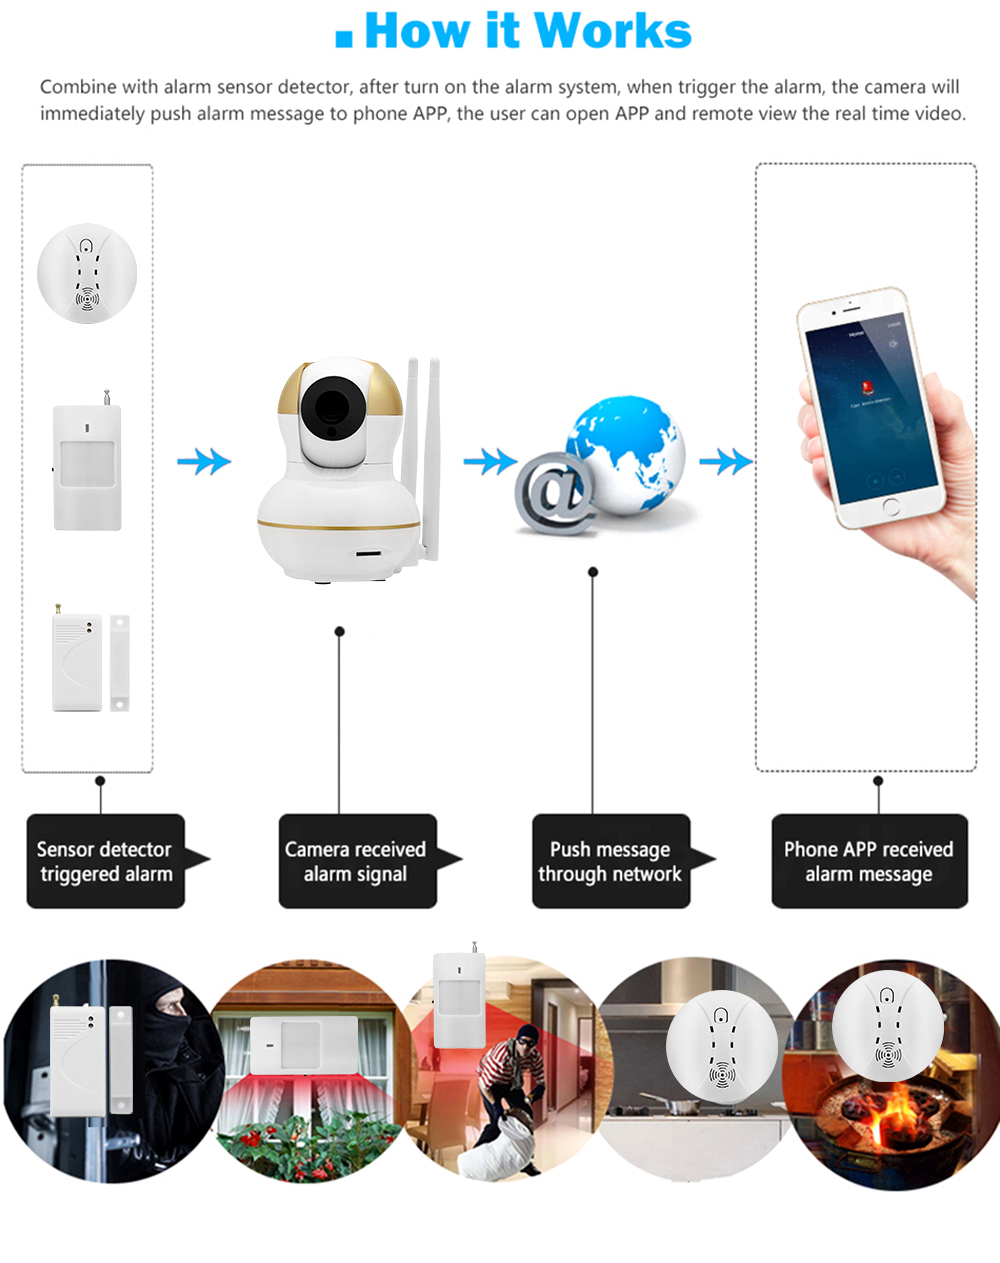 Wistino Alarm Systems Security WIFI IP Camera Security System Video Monitor Surveillance Camera Wireless Home Alarm System With Sensor Alarm Wifi kit Smart Home Camera (5)